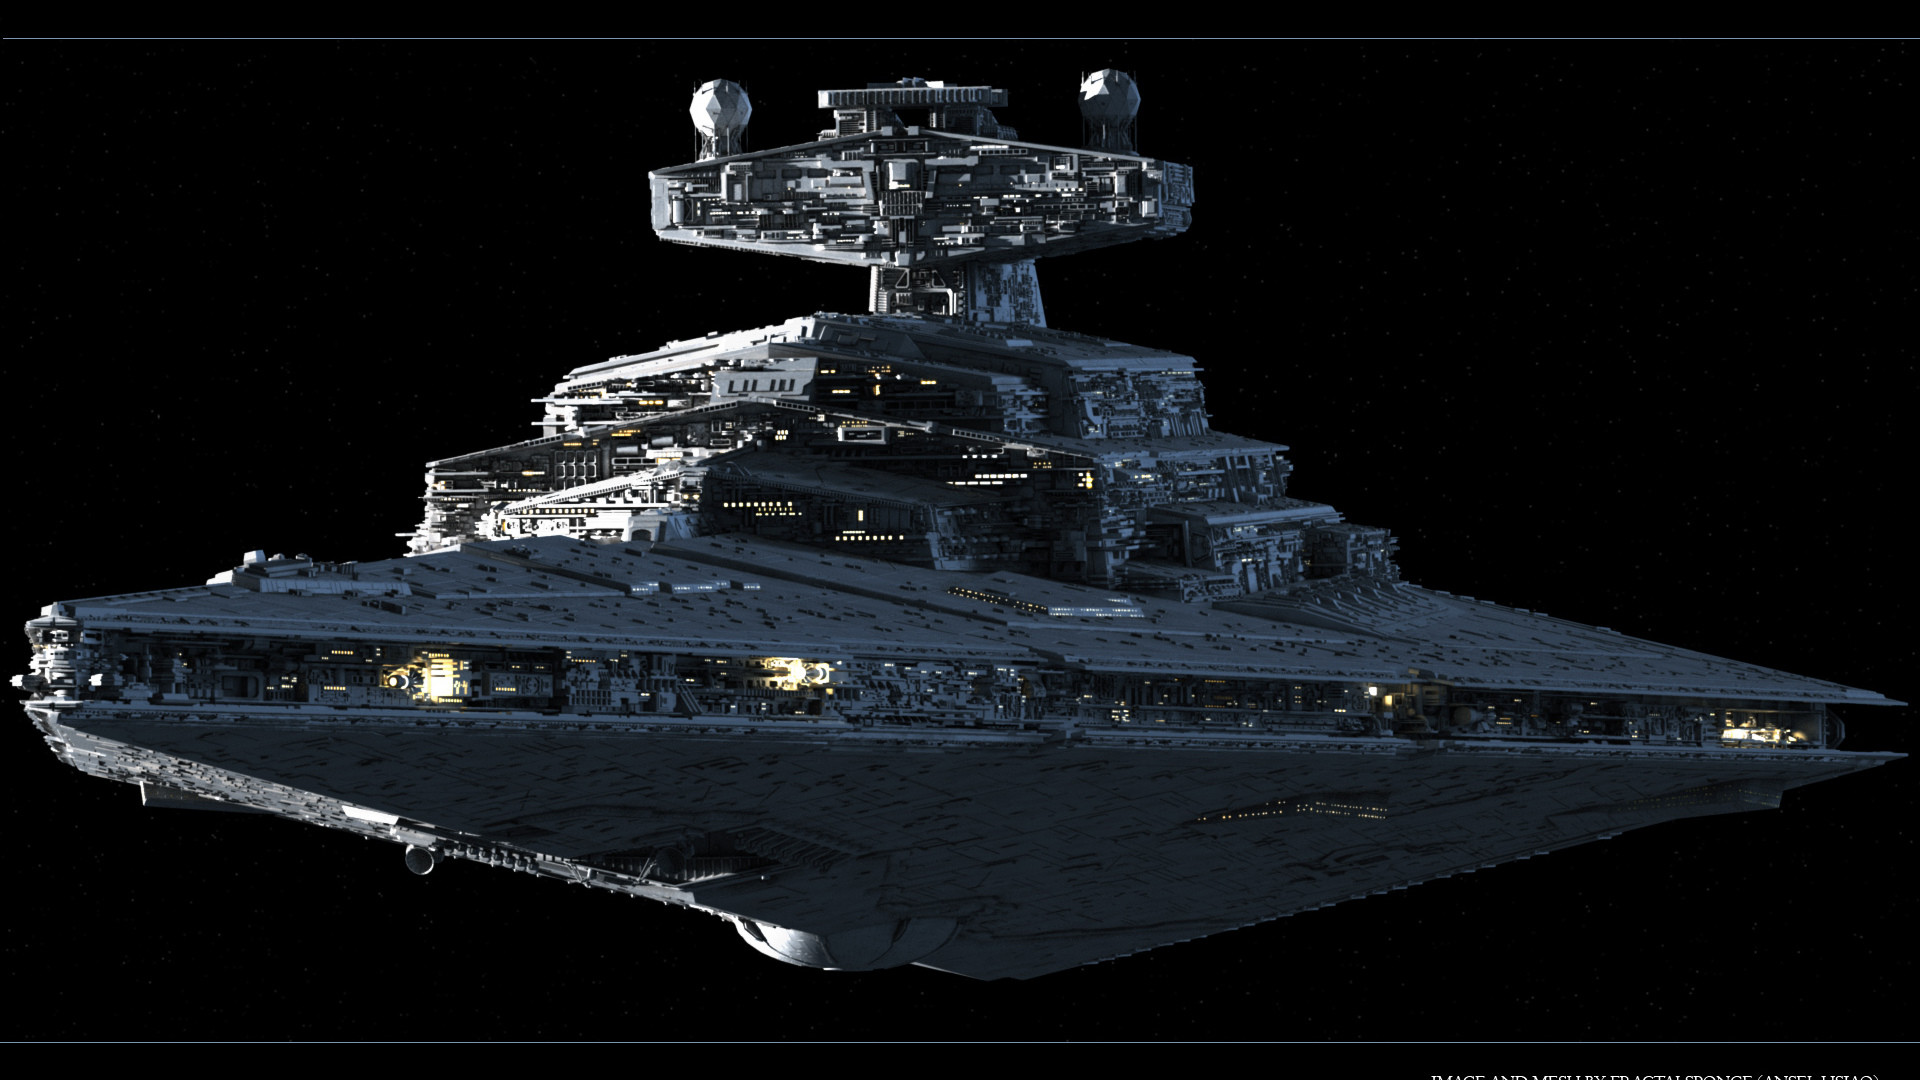 Spaceship Wallpapers